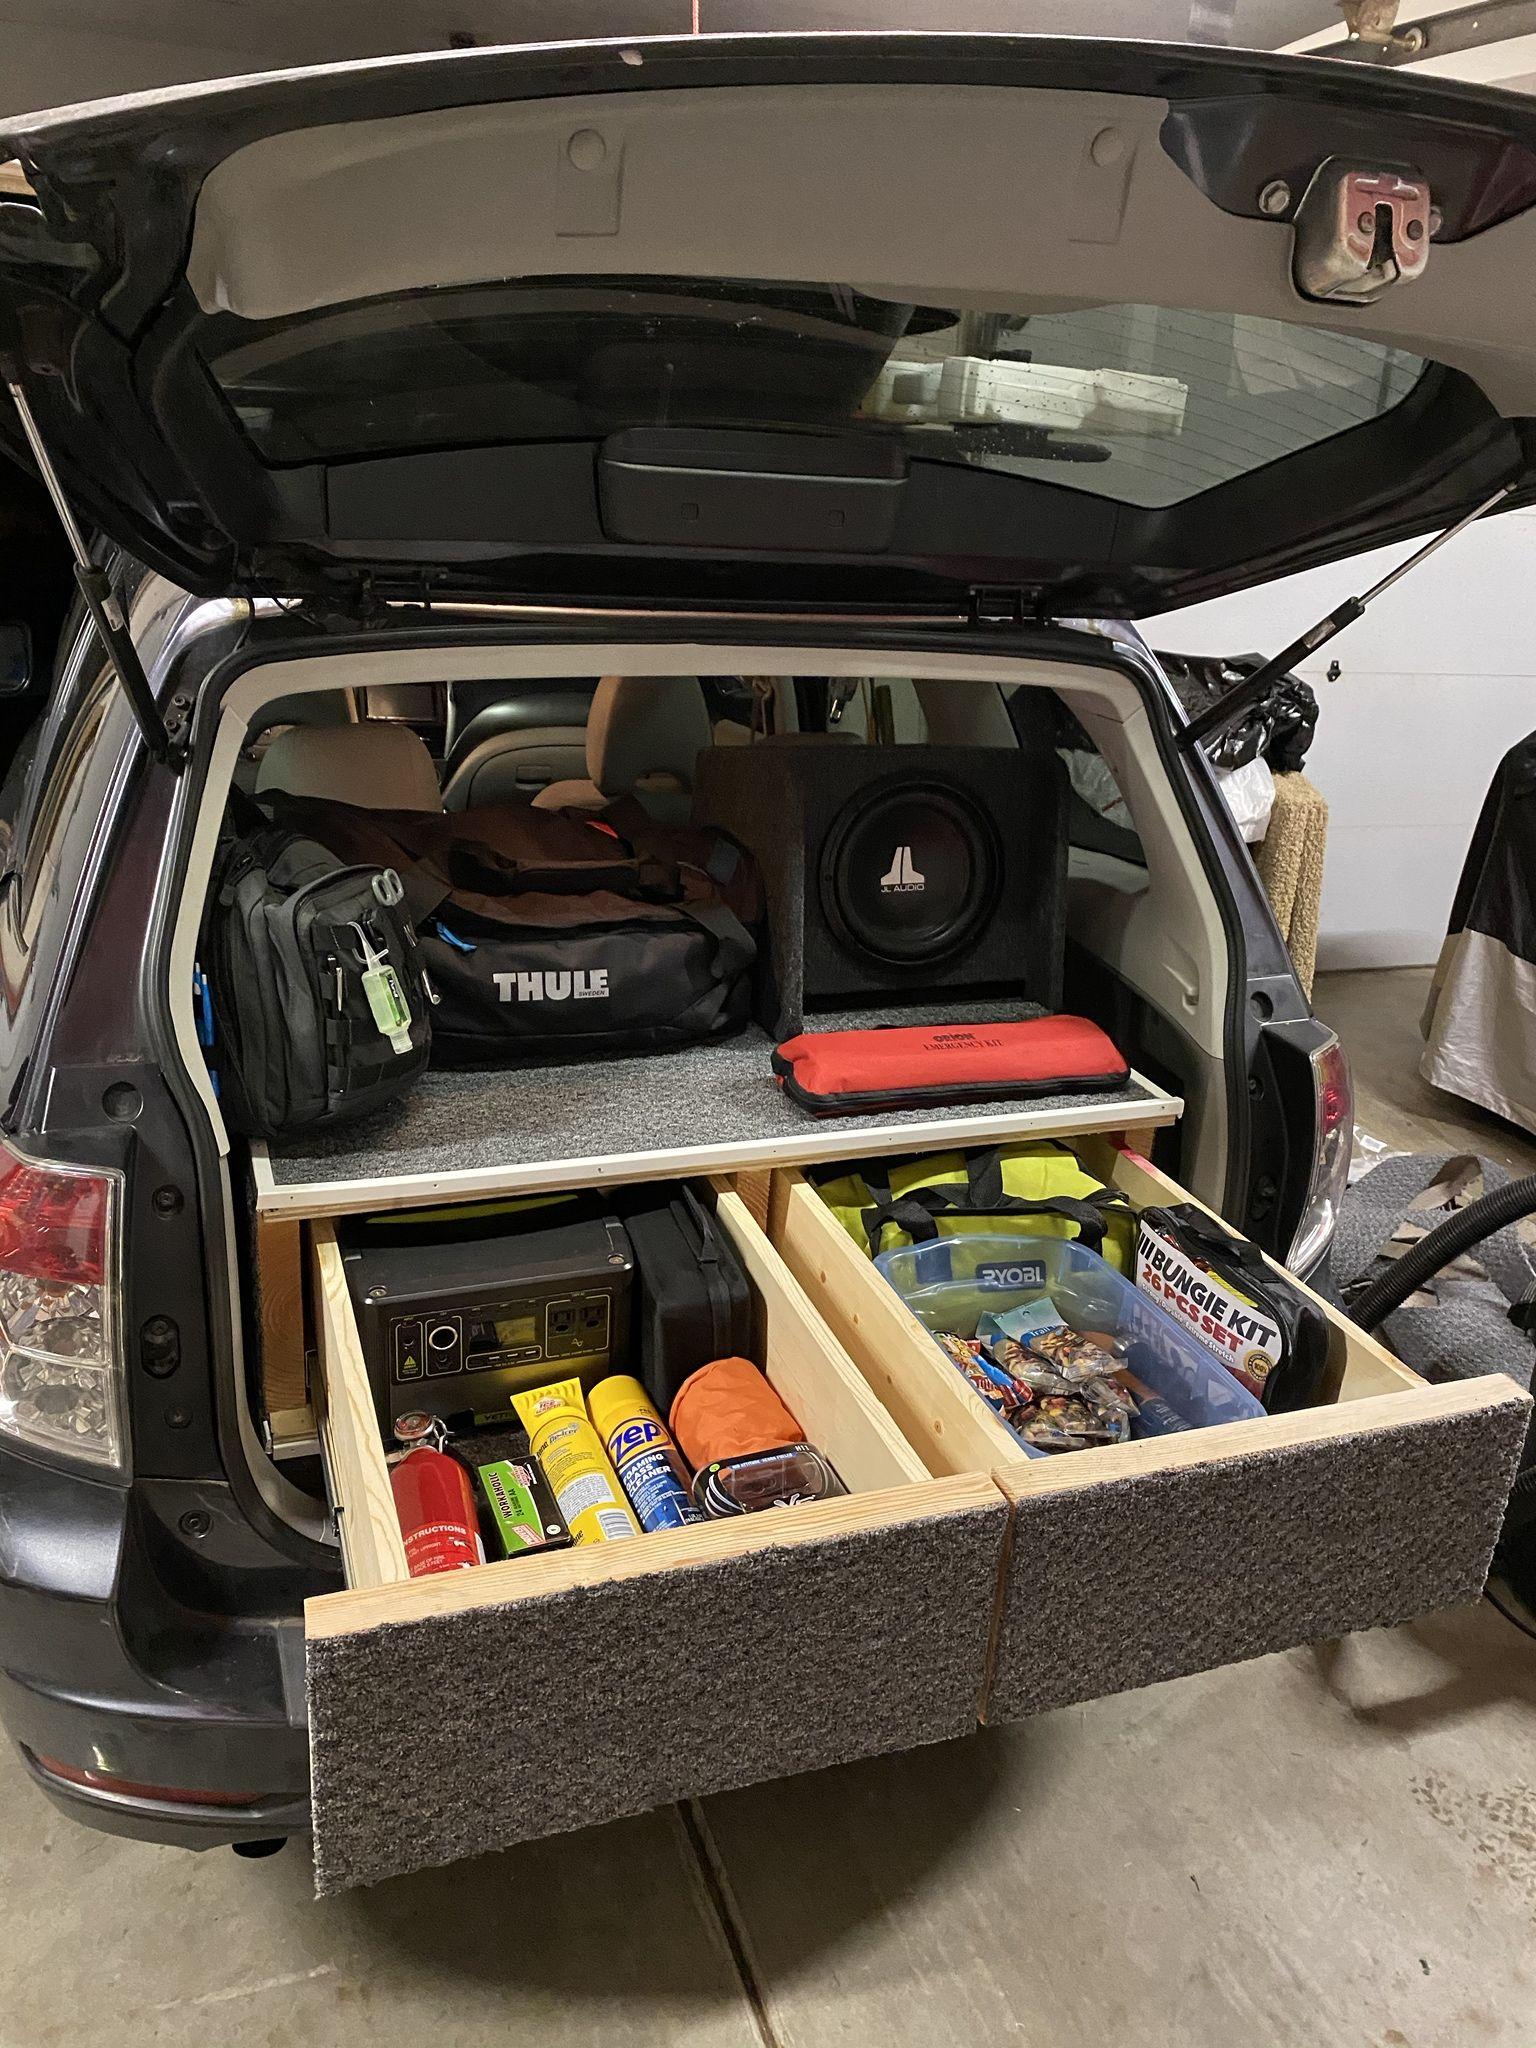 2011 Subaru Forester Drawer System Handmade Crafts Howto Diy Subaru Forester Subaru Outback Accessories Suv Camper